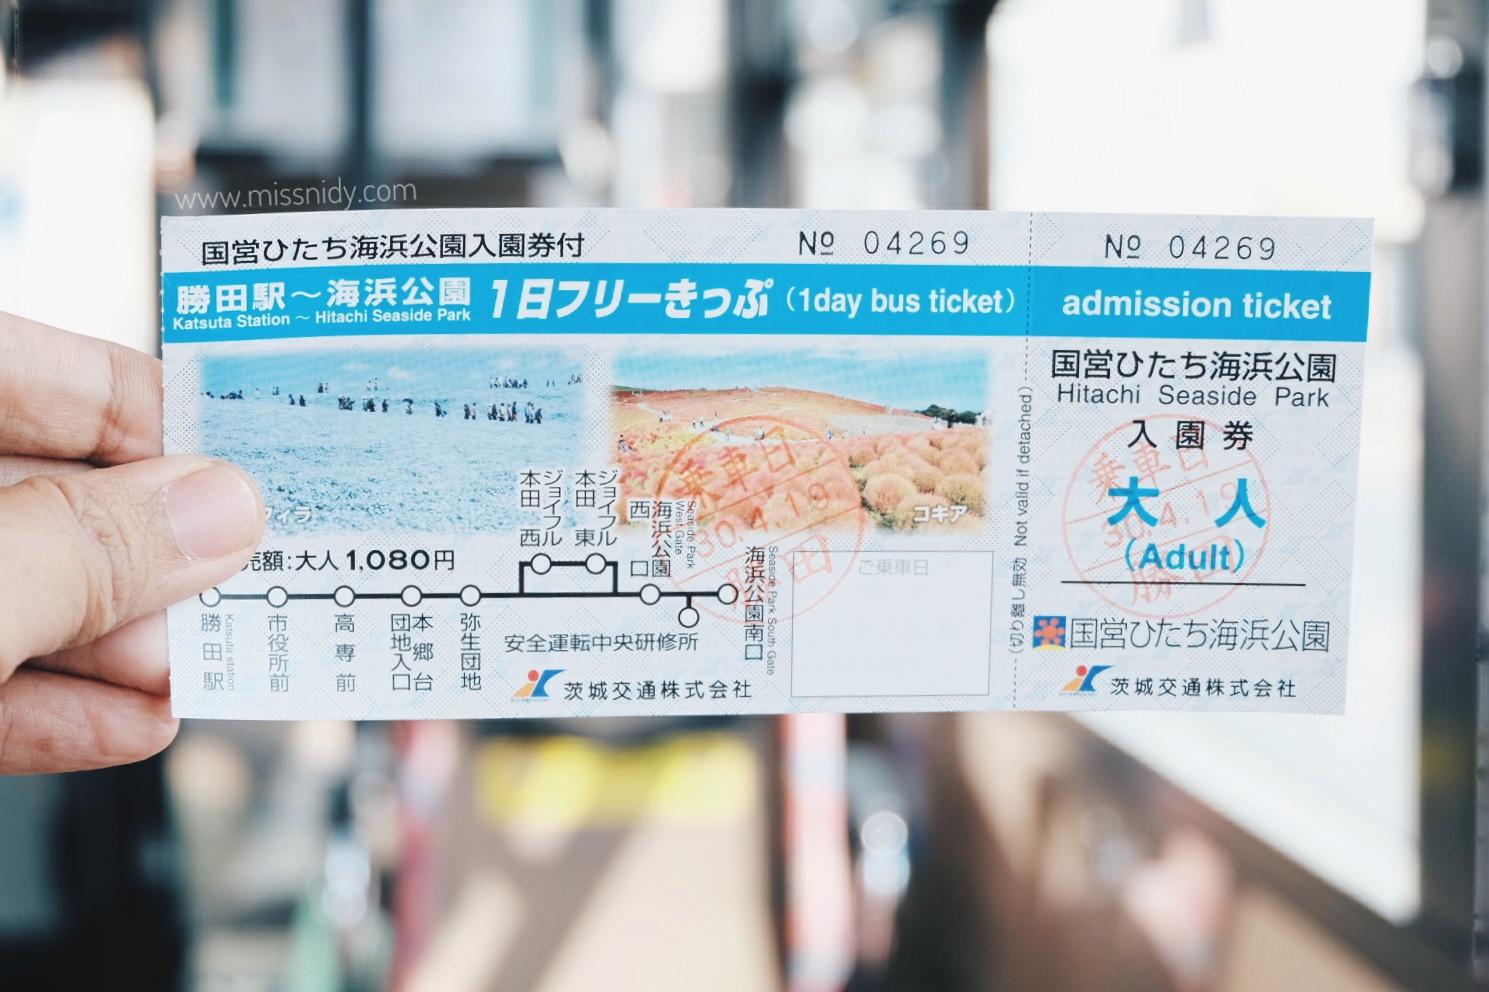 harga tiket masuk hitachi seaside park